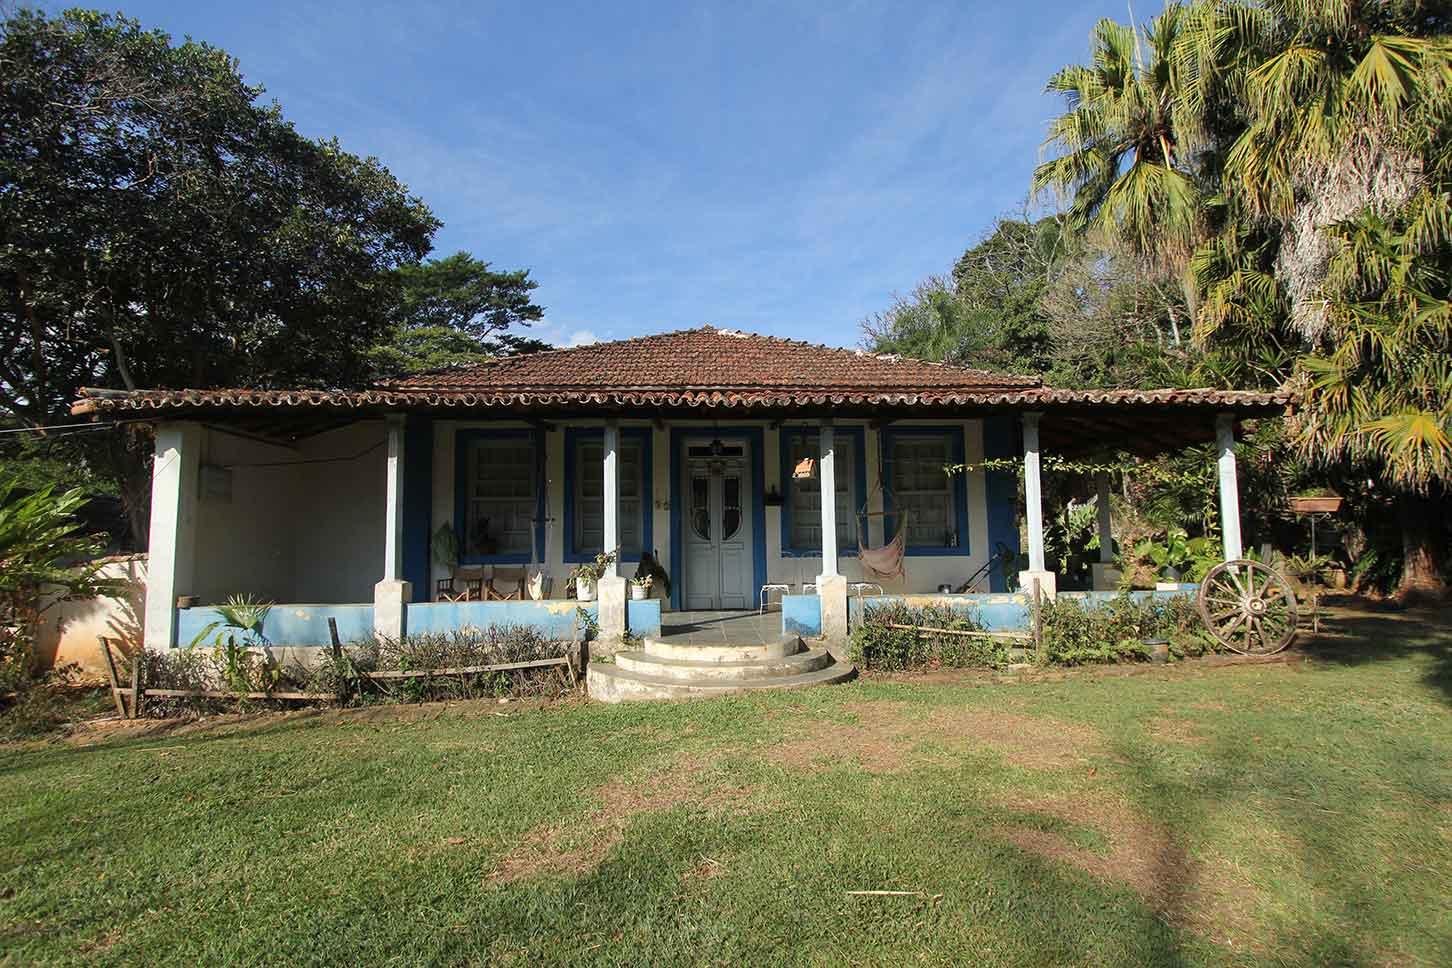 Fazenda Luiz Gonzaga-louveira-turismo-rural-IMG_7323-bx